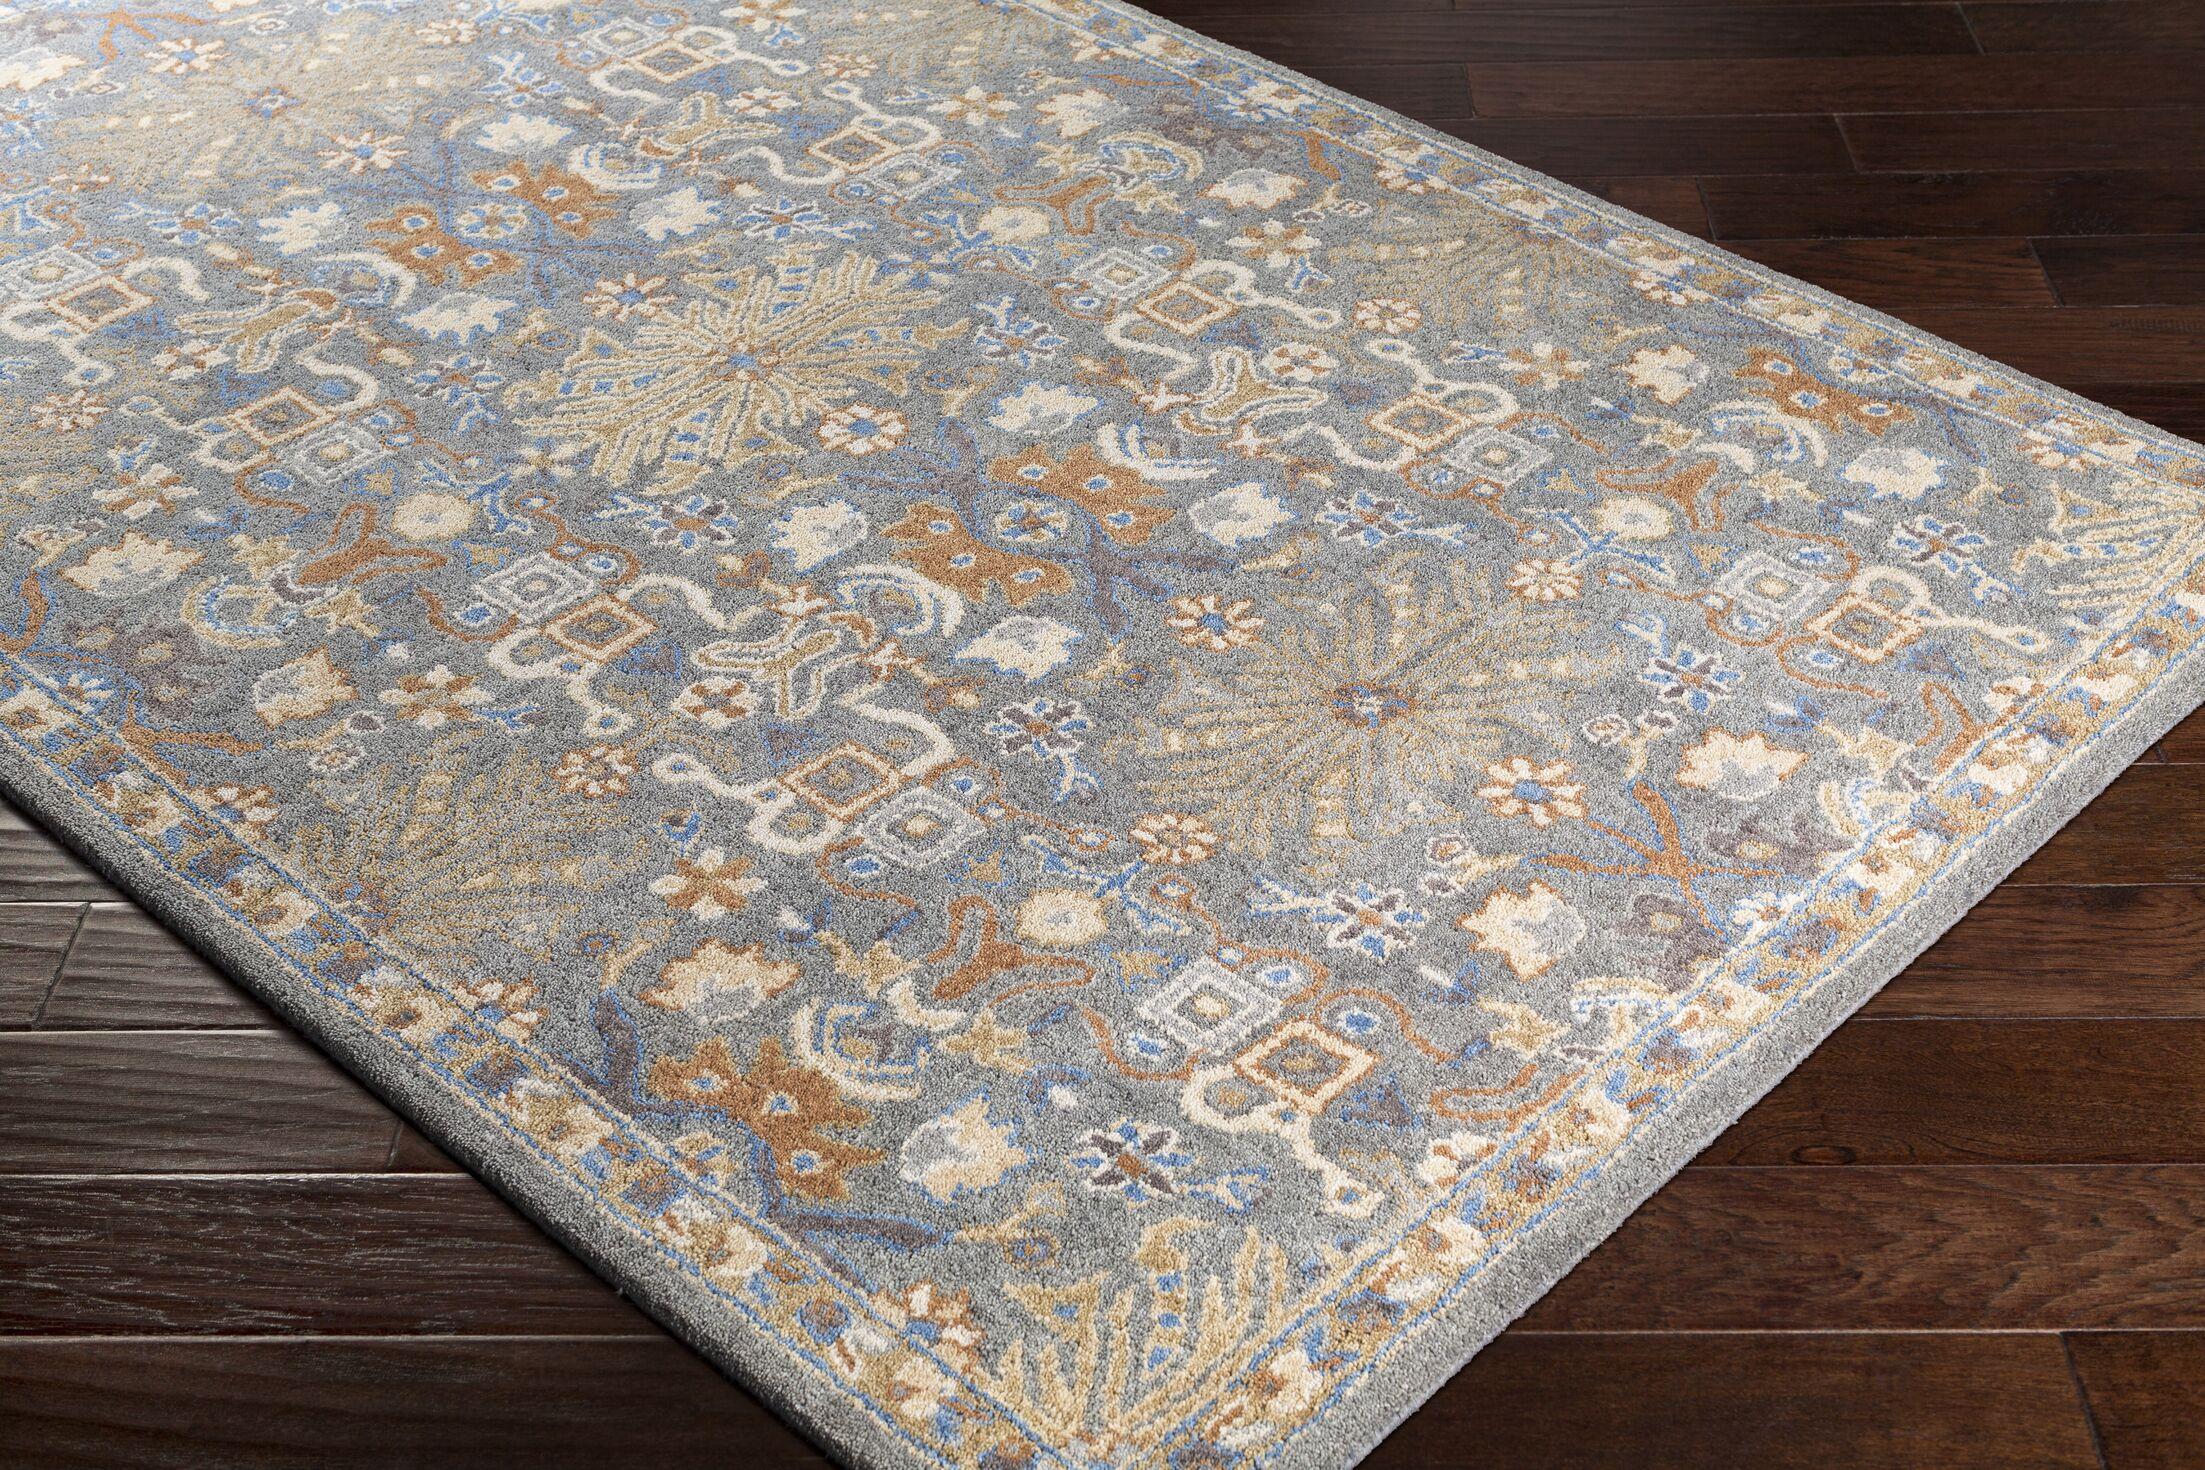 Pewitt Hand-Tufted Wool Navy/Medium Gray Area Rug Rug Size: Rectangle 5' x 7'6